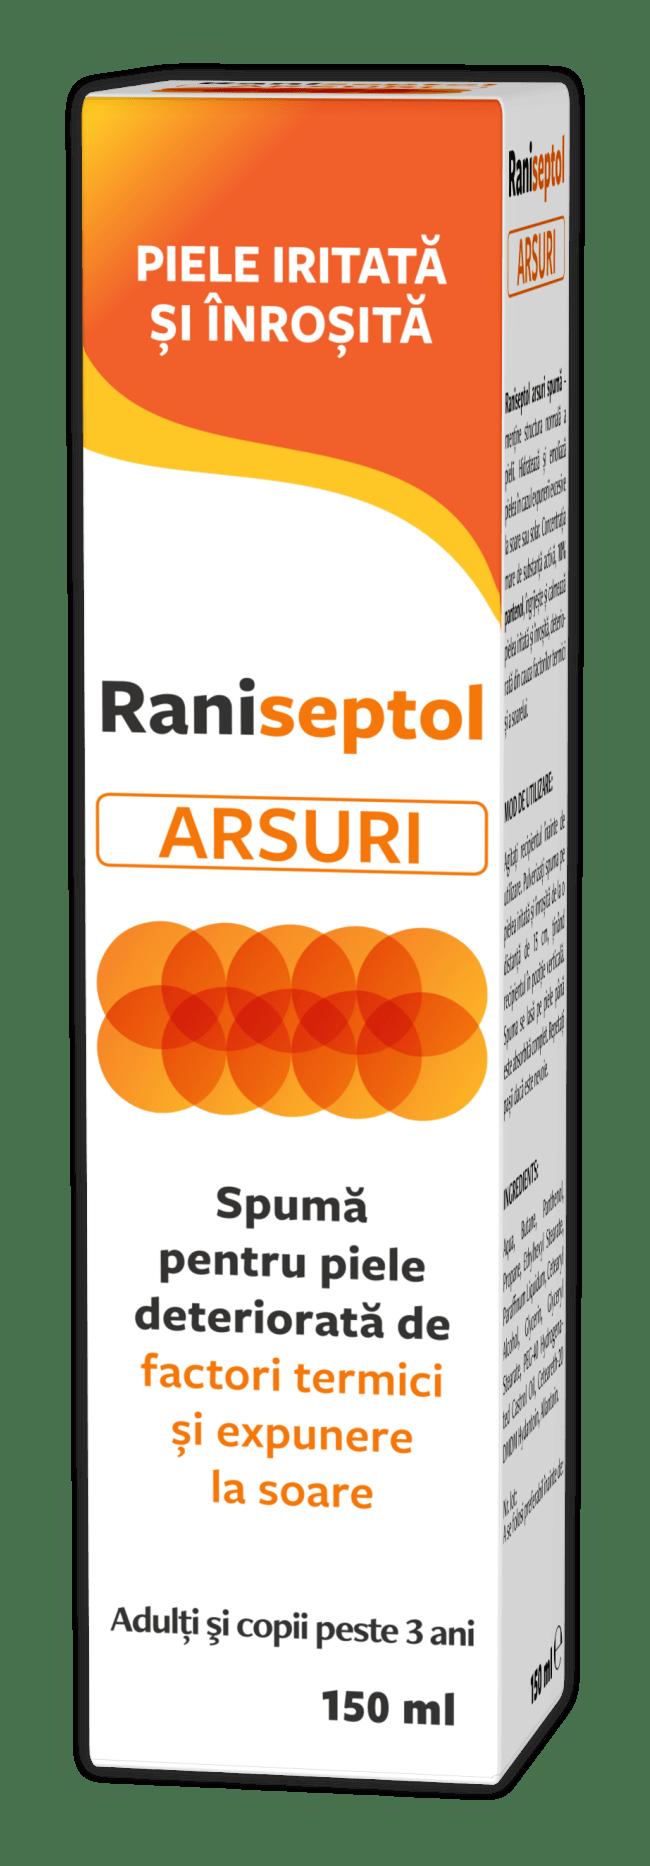 Raniseptol arsuri